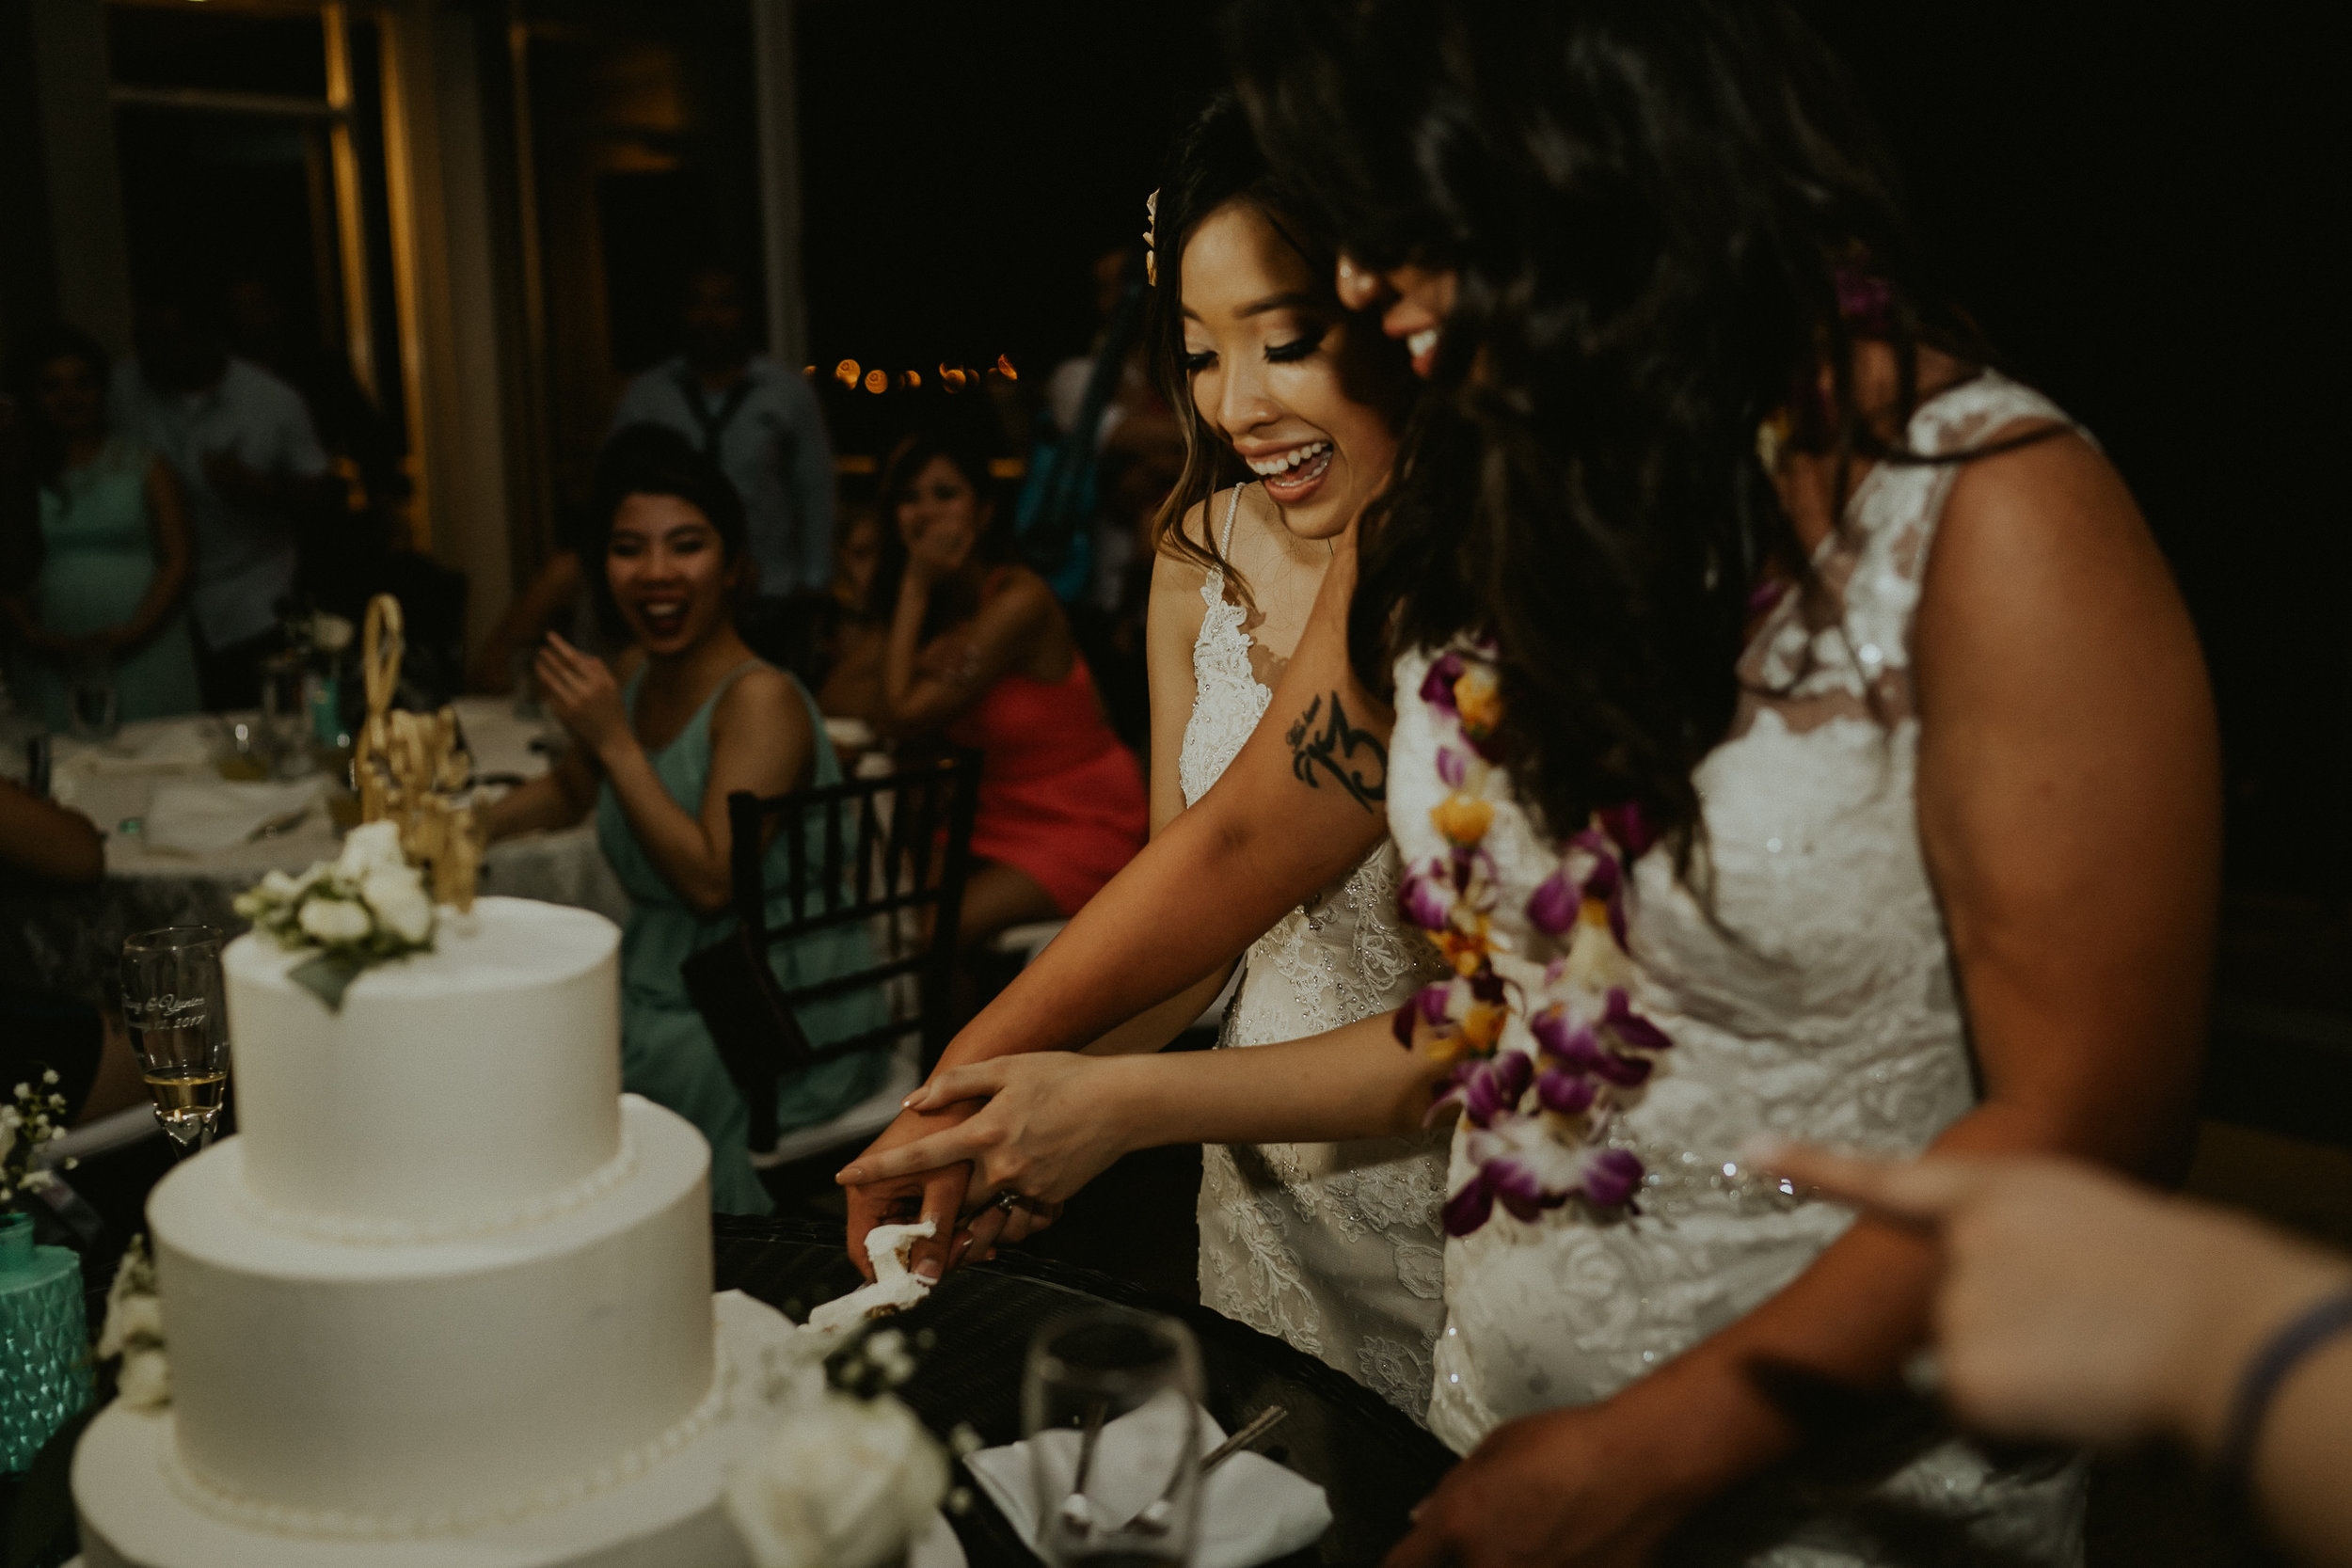 Maui_Destination_wedding_Alfred_Tang-95.jpg